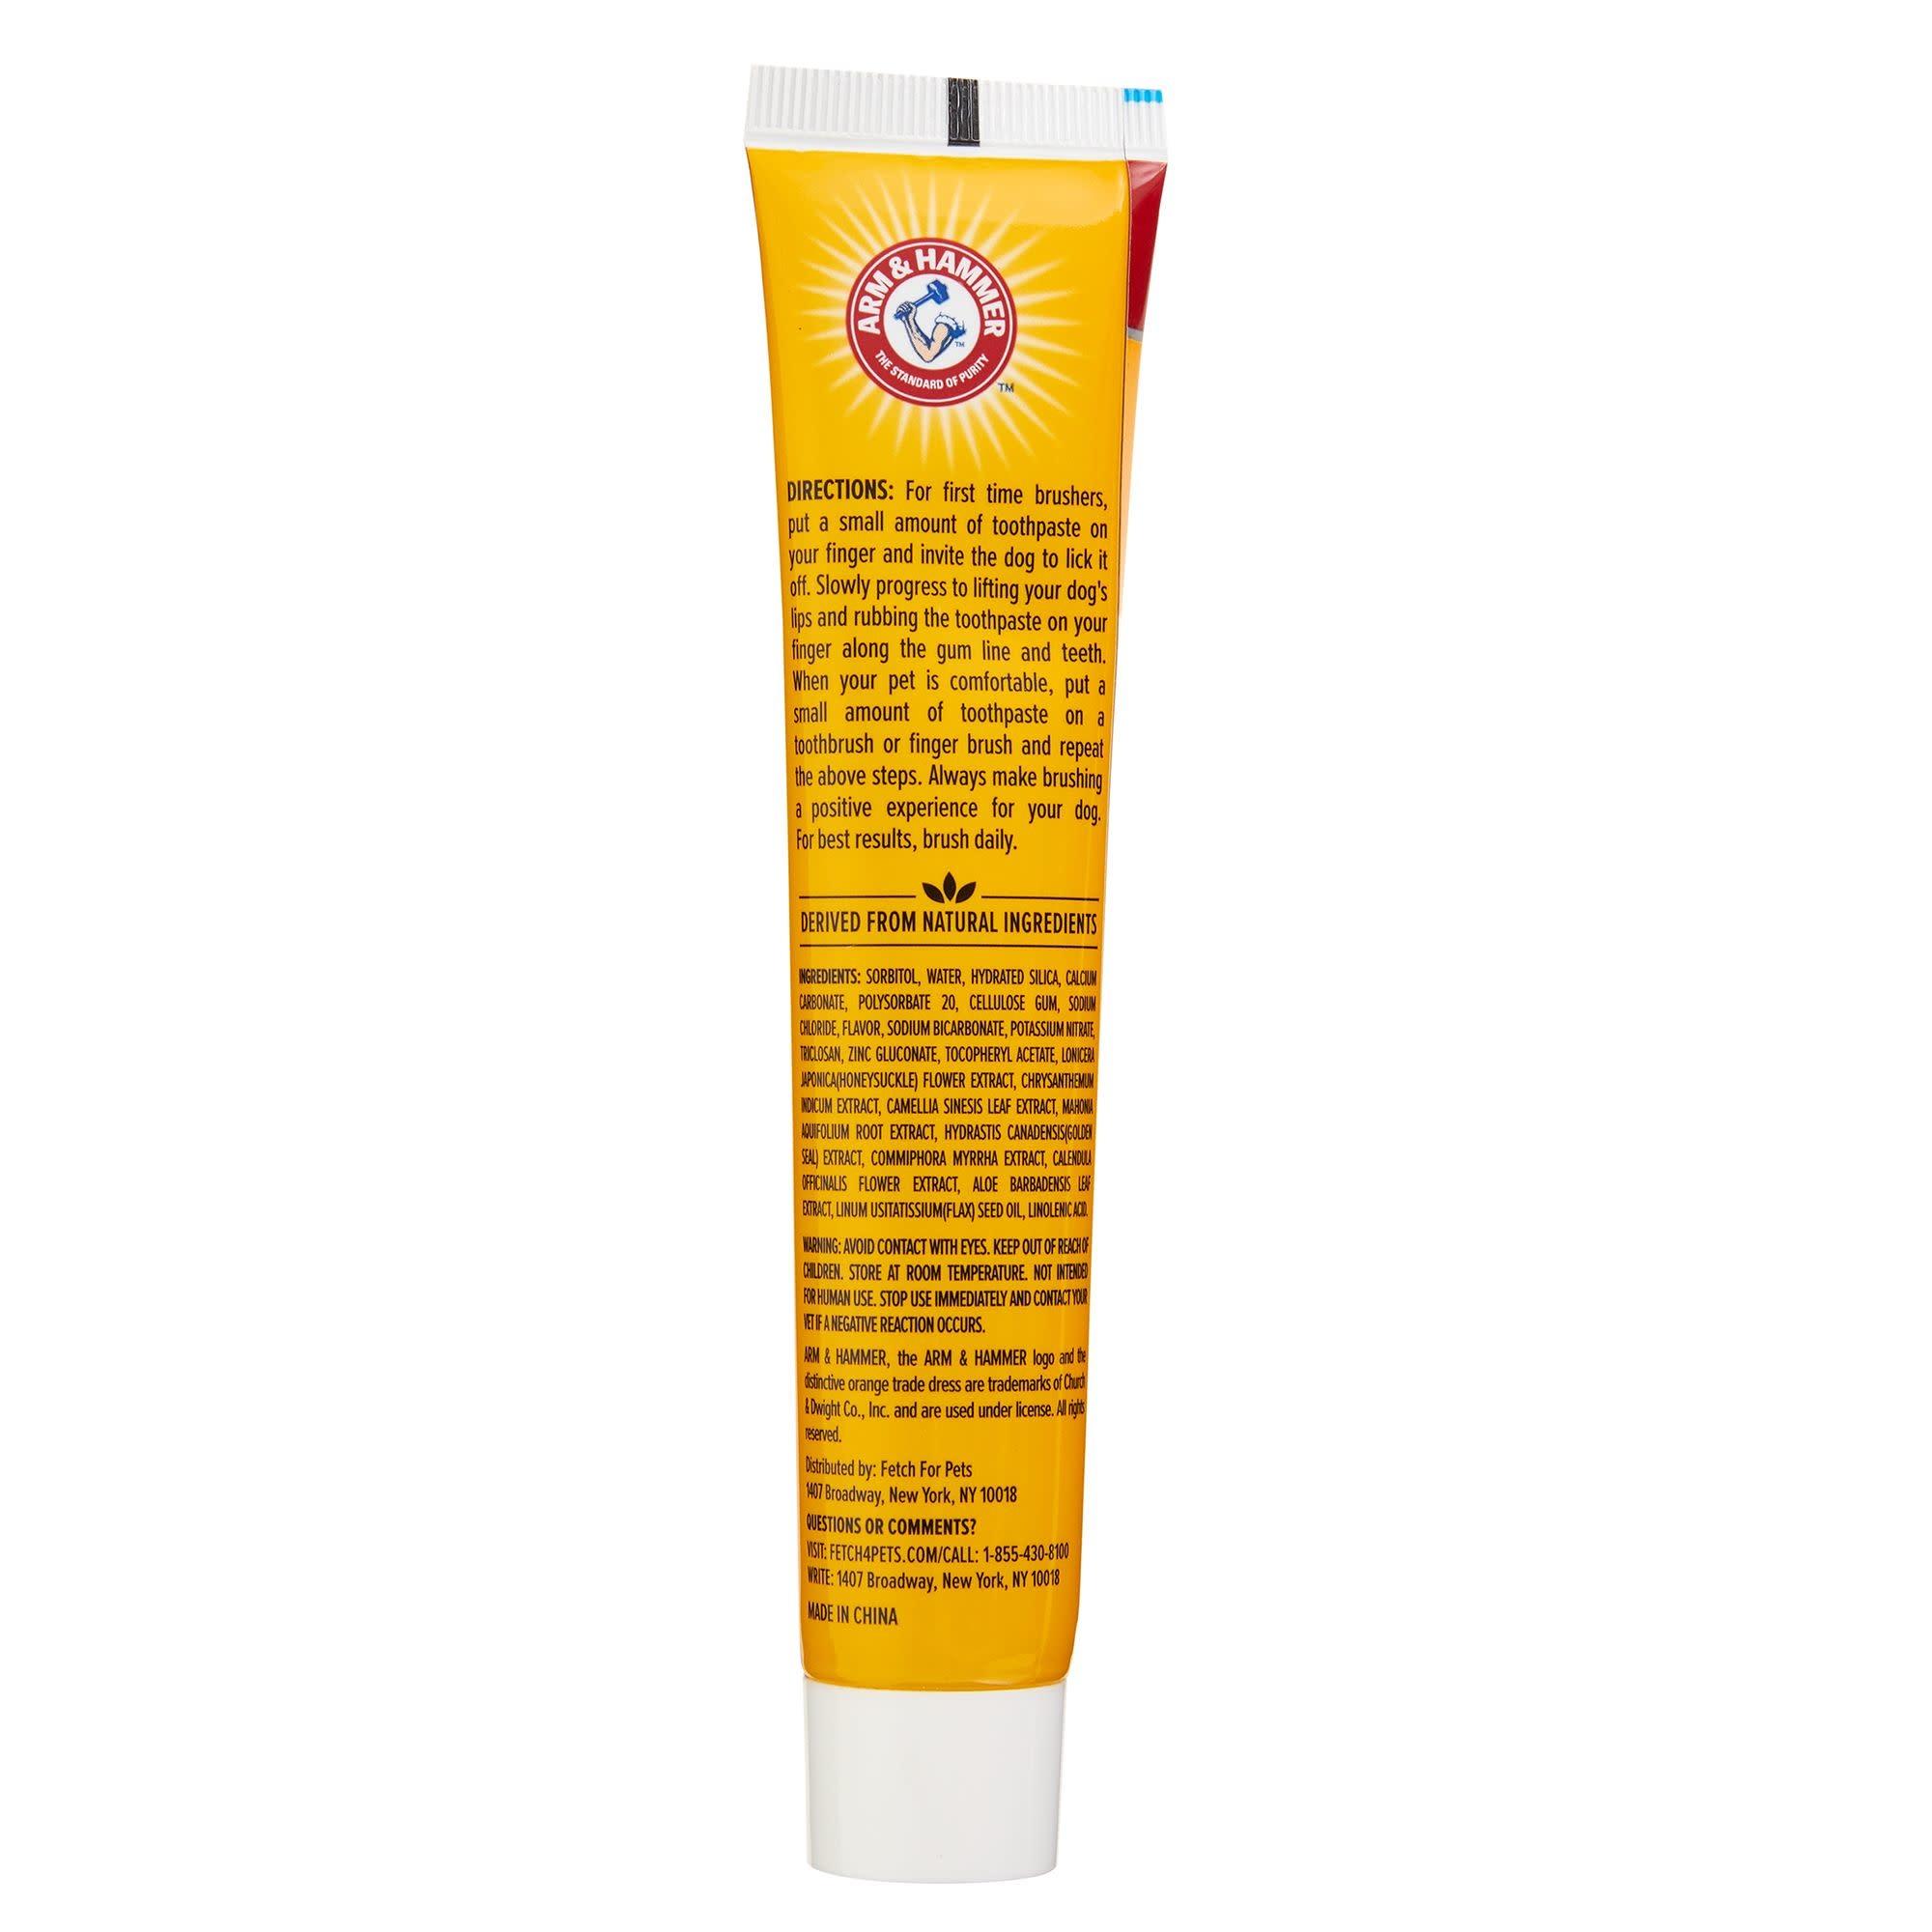 Arm & Hammer Clinical Gum Health Kit